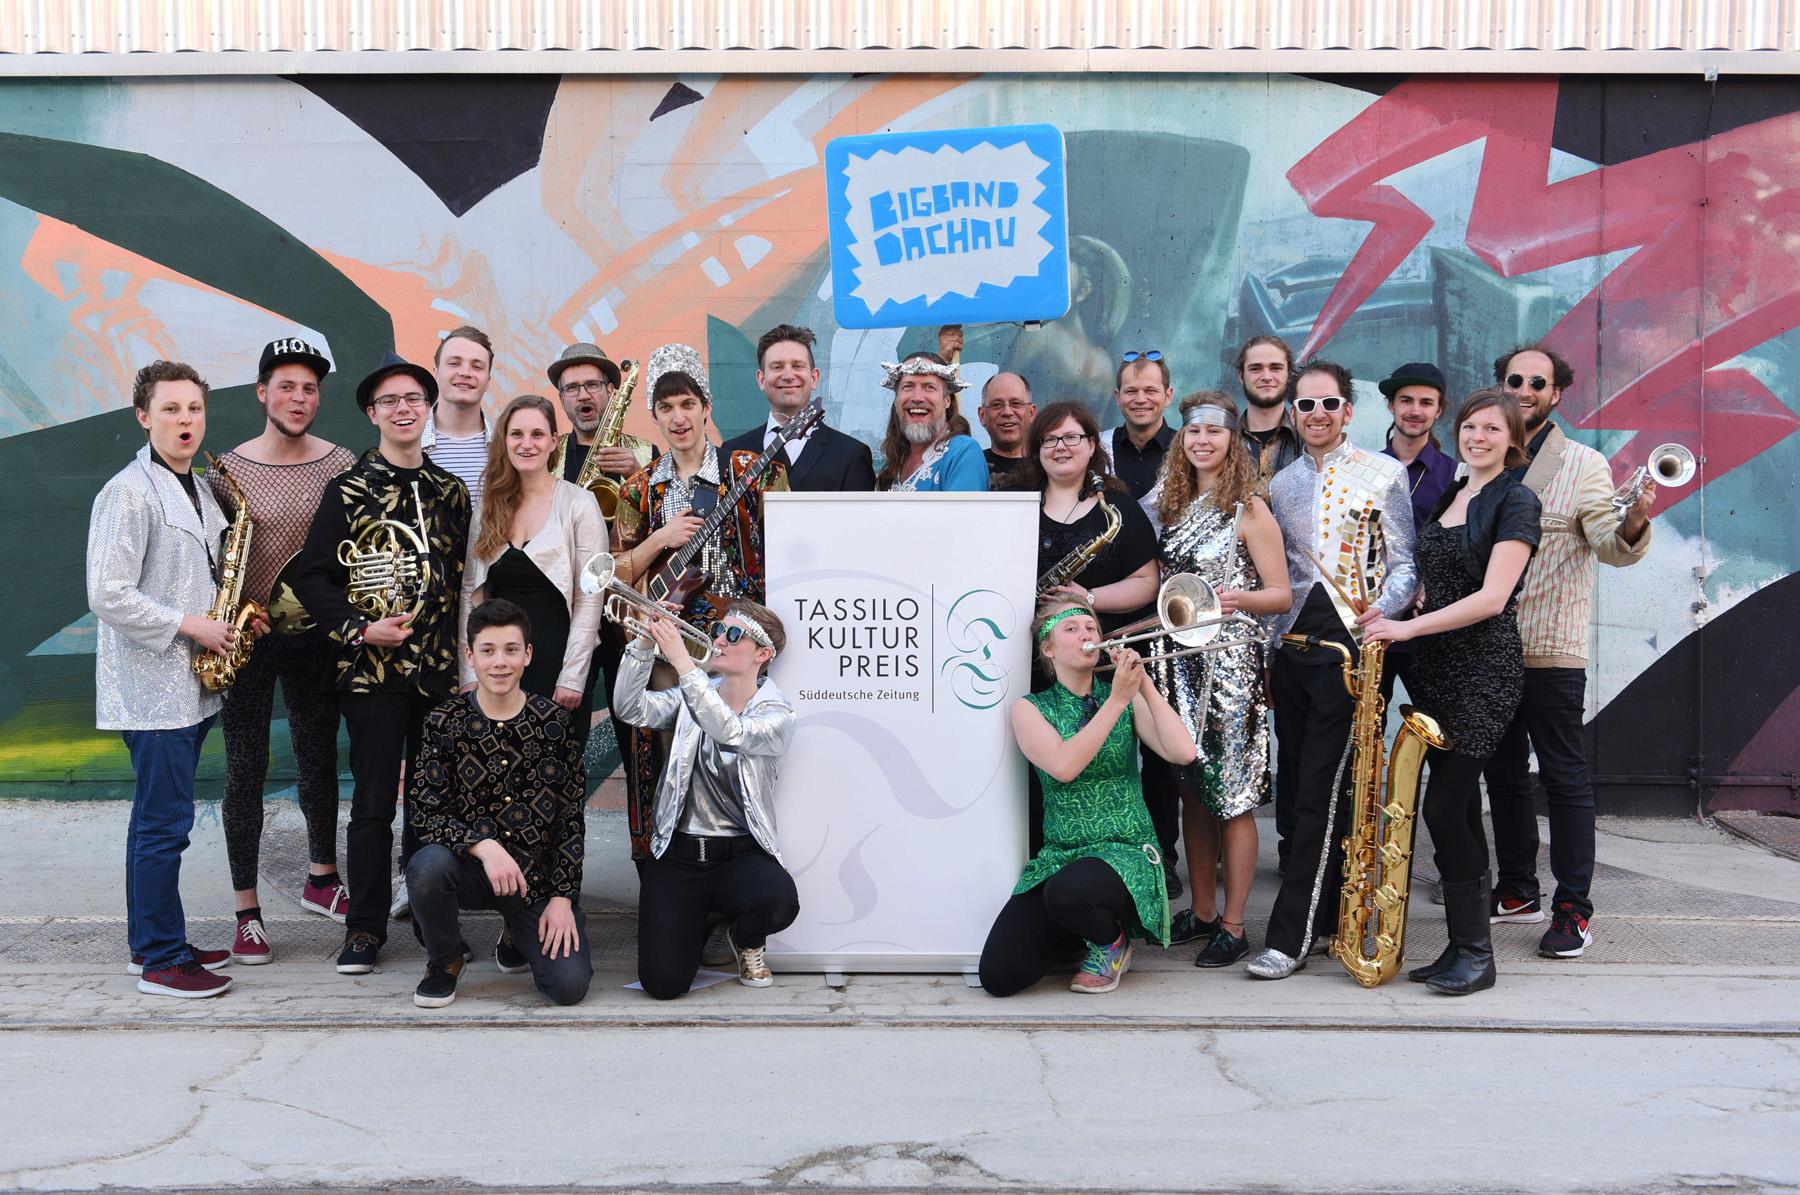 München, 18.4.2018 / Foto: Robert Haas / Preisverleihung Tassilo 2018 / Hauptpreis Bigband Dachau